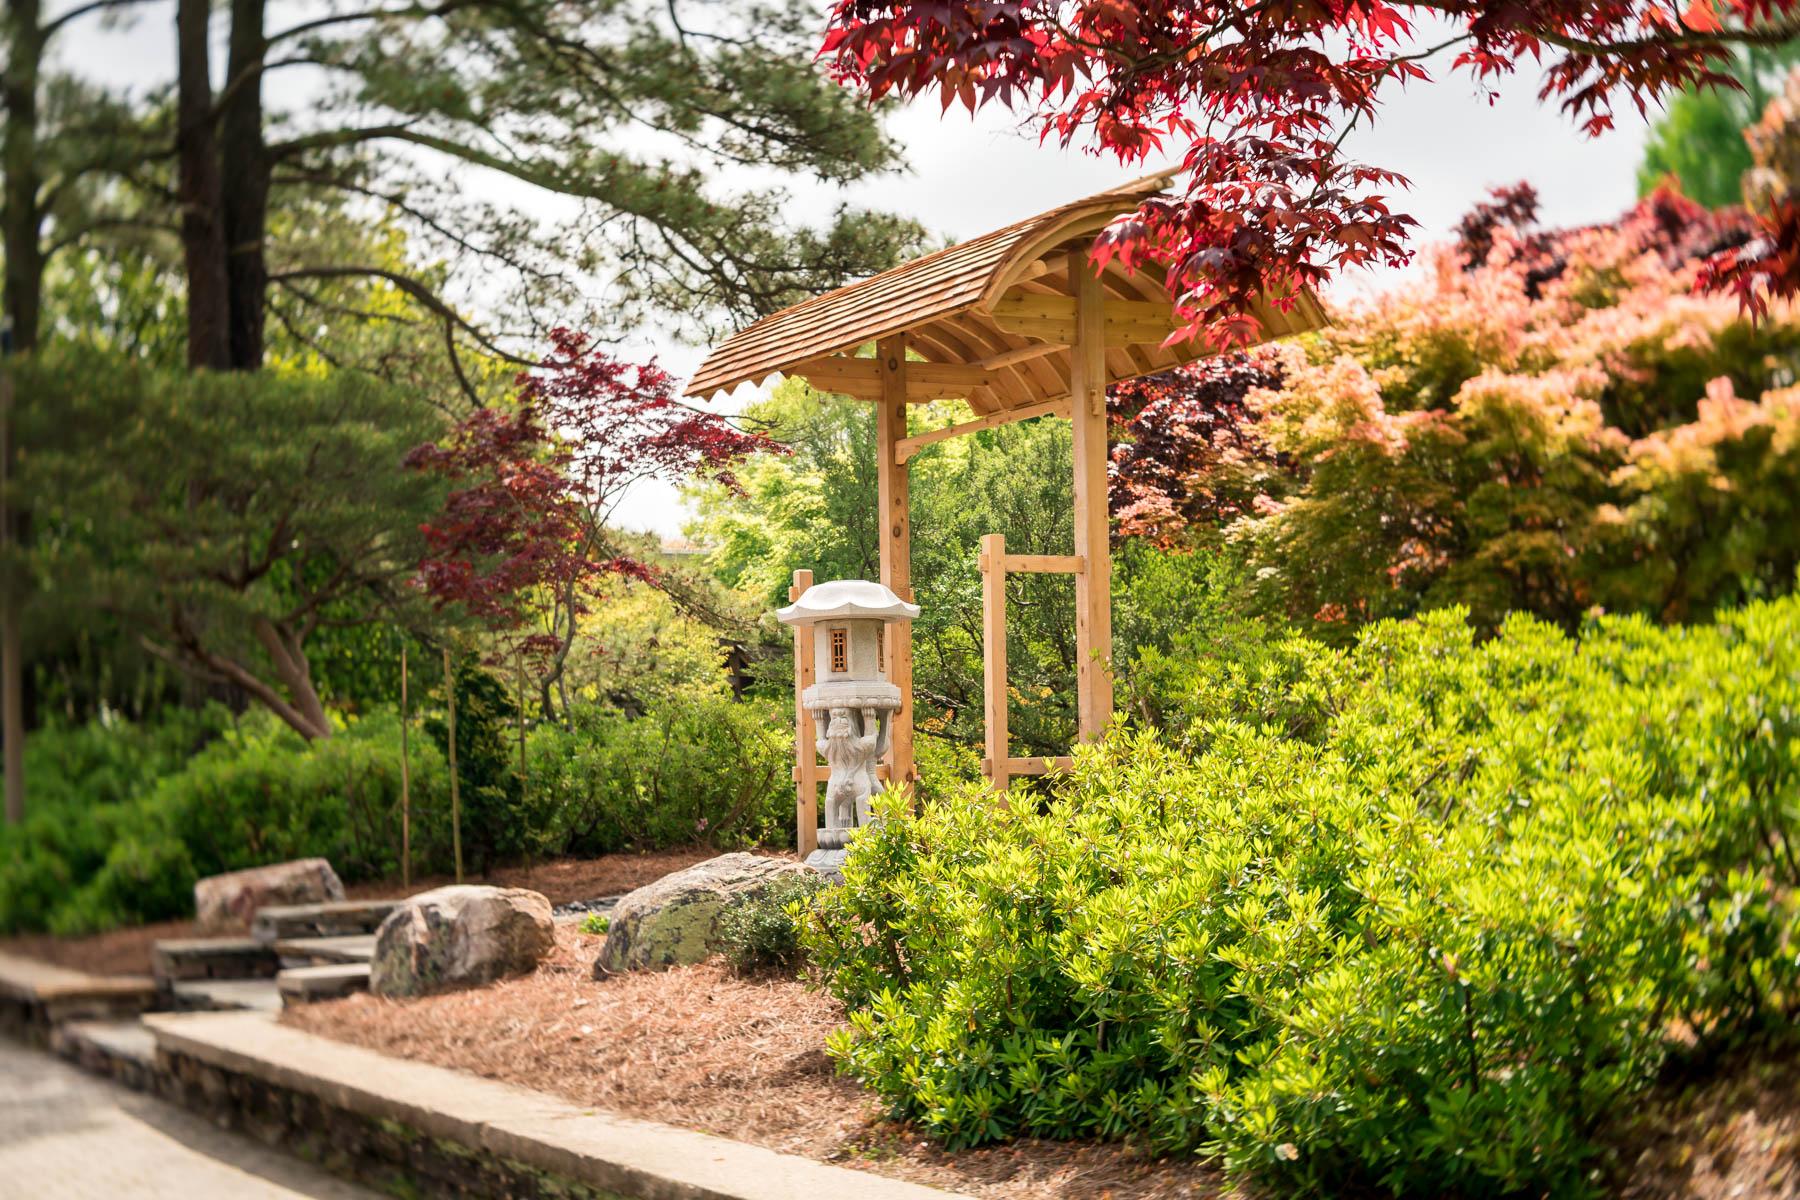 2018.04.25 Norfolk Botanical Gardens © Jennifer Carr Photography Virginia Beach-1.jpg